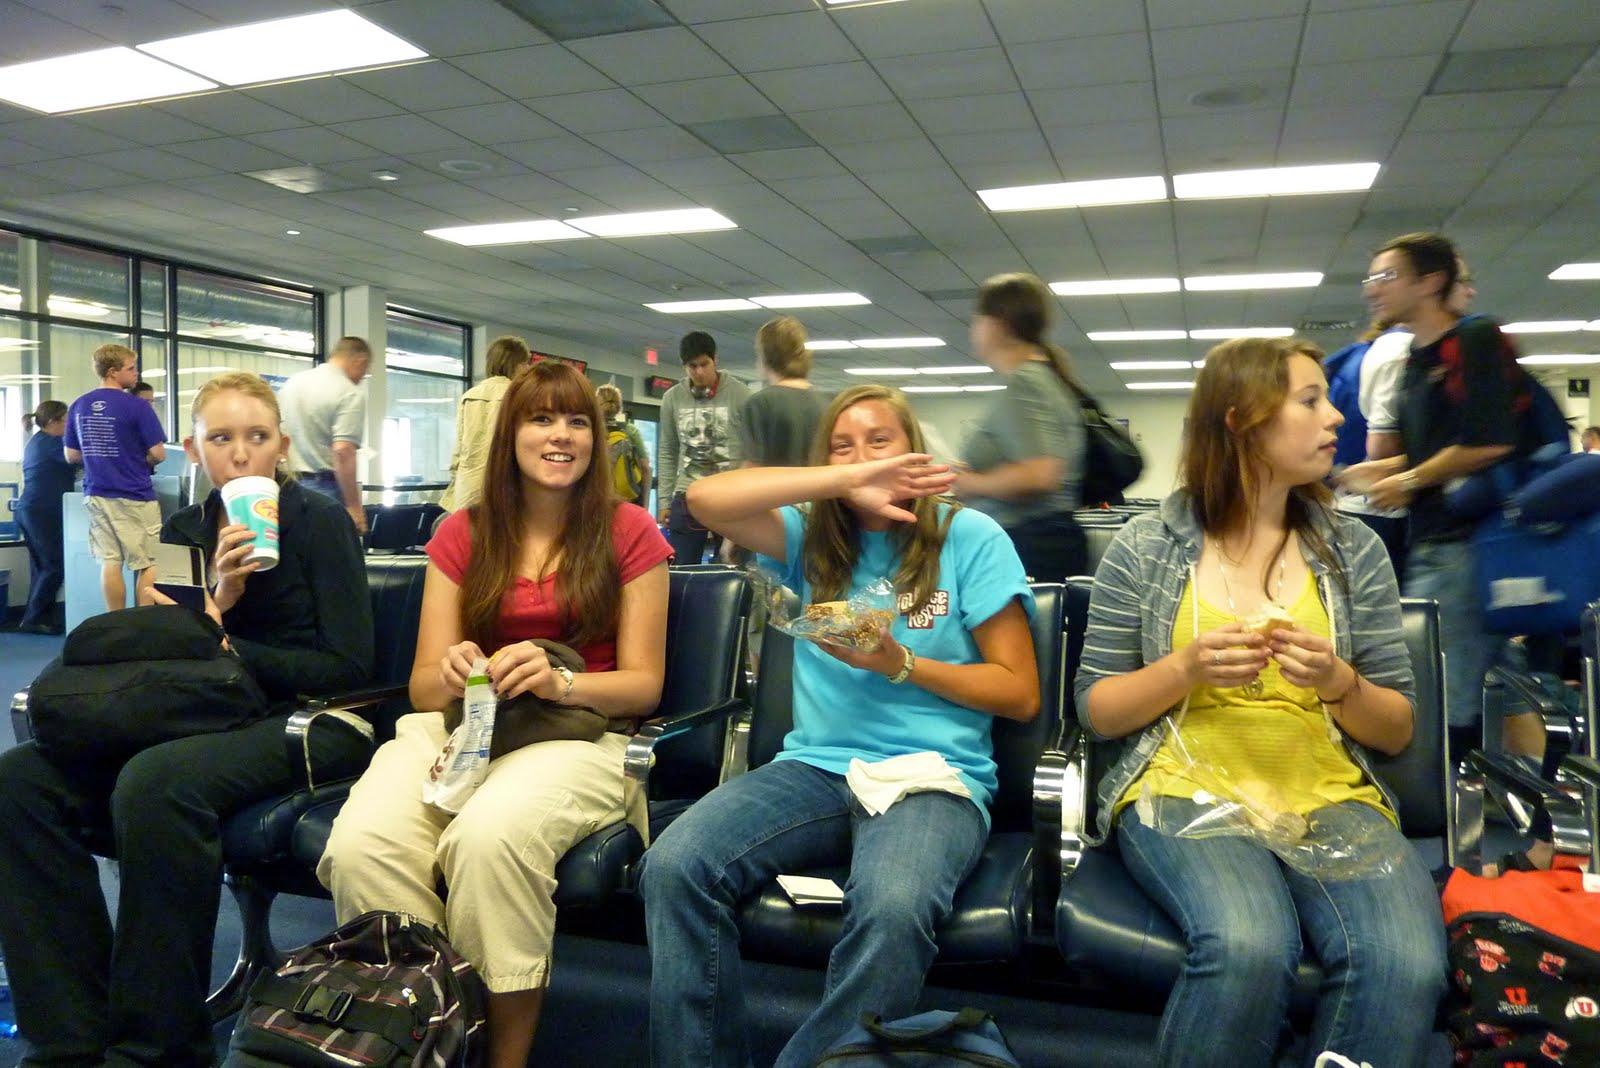 Melissa, Jessi, and Jamie eating their chocolate mooses